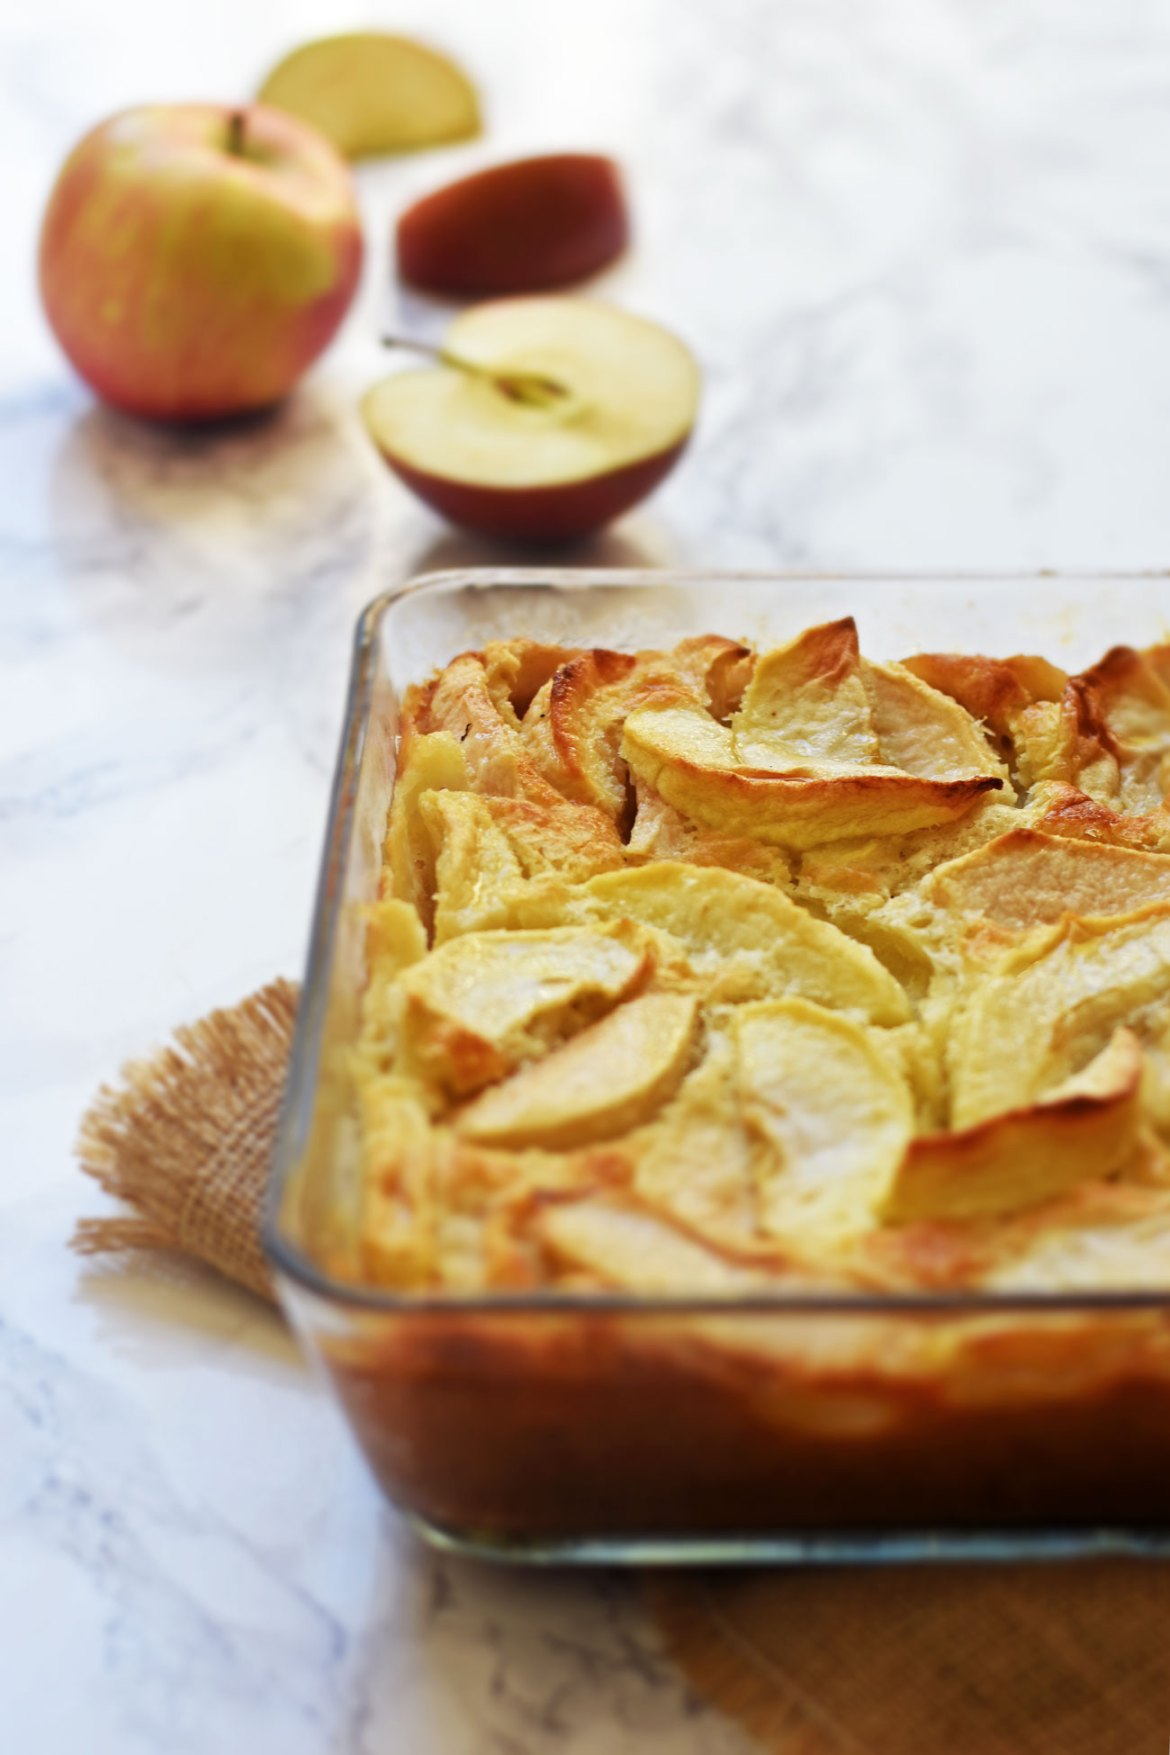 Calvados and Apple Flan